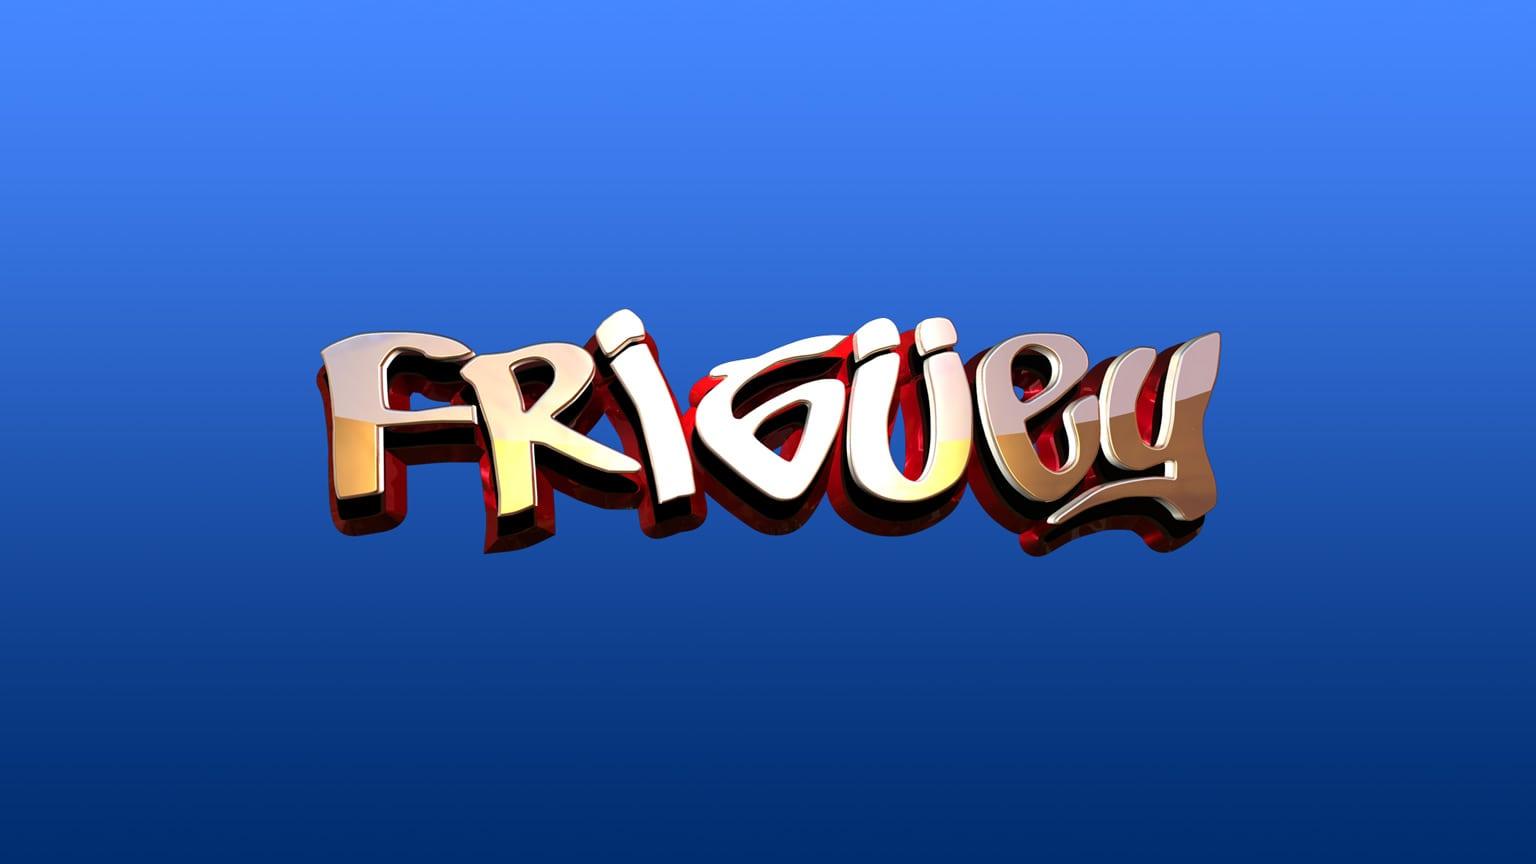 friguey-logo-victor-ruano